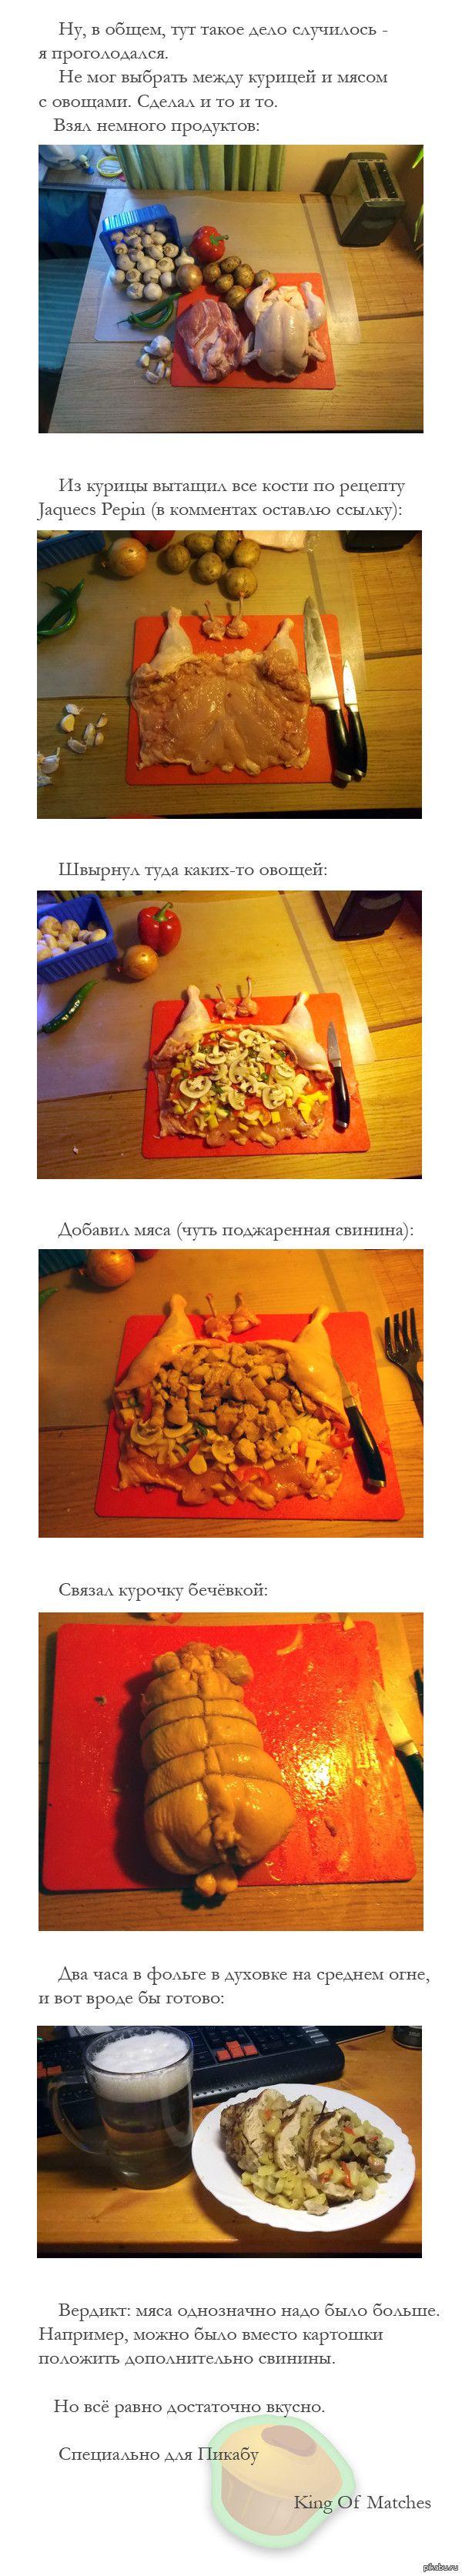 Правильная курица Вкратце: овощи с мясом в мясе